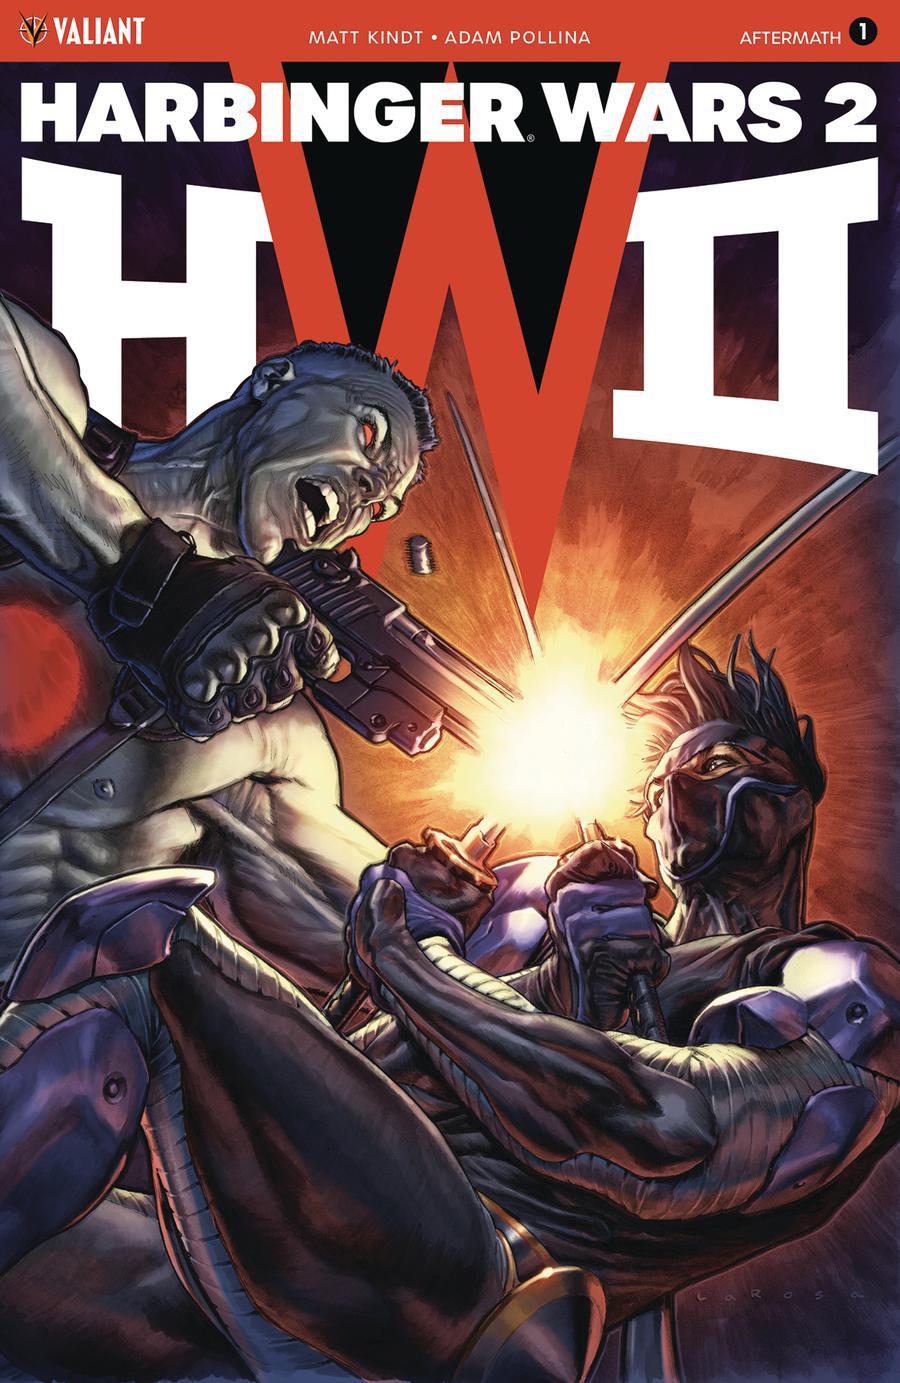 Harbinger Wars 2 Aftermath #1 Cover B Variant Lewis Larosa Cover